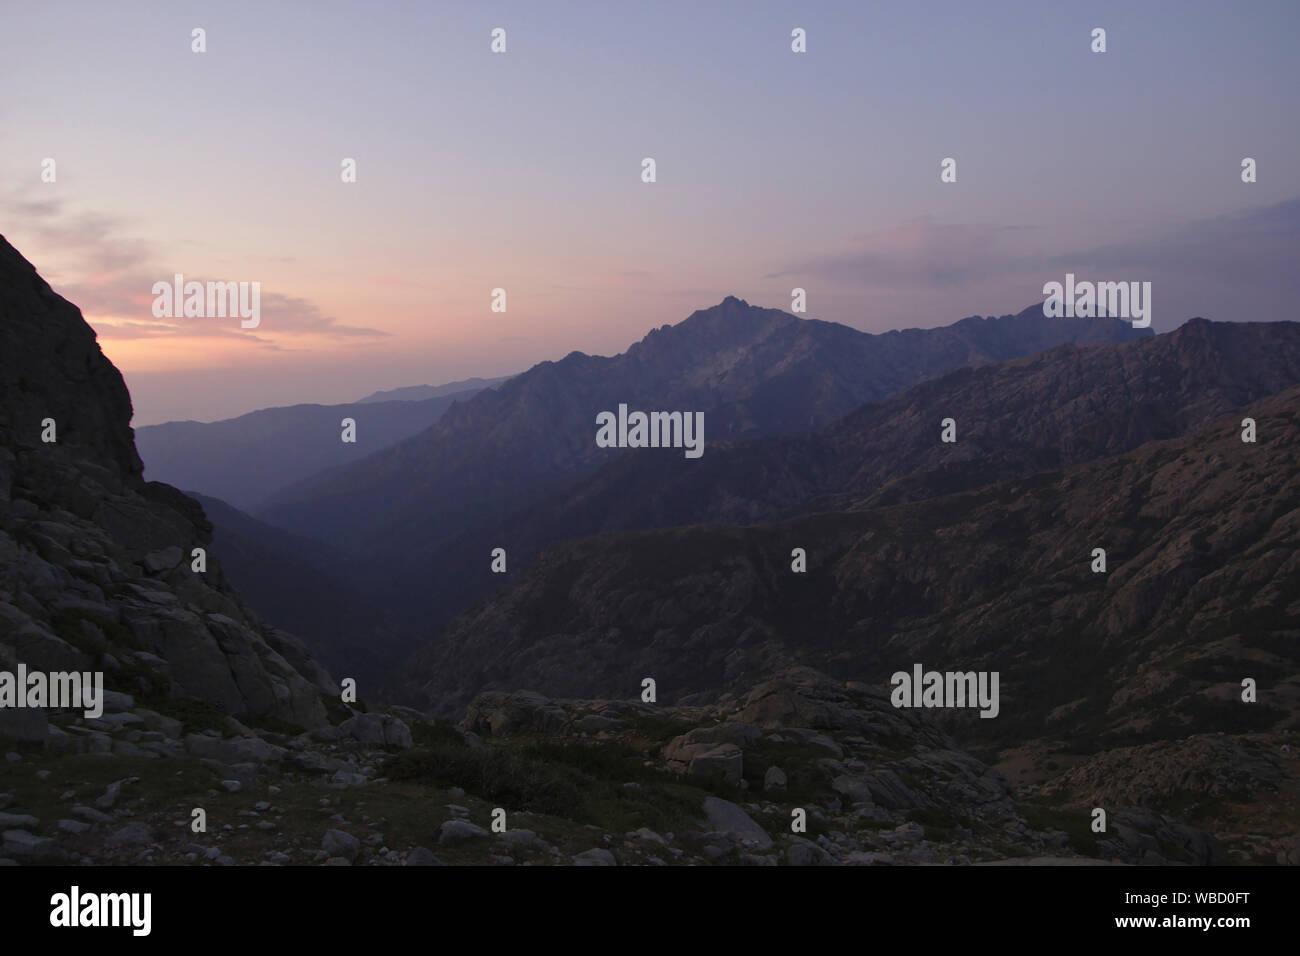 Monte d'Oro, ascent from Pietra Piana to Monte Rotondo, morning light, France, Corsica Stock Photo